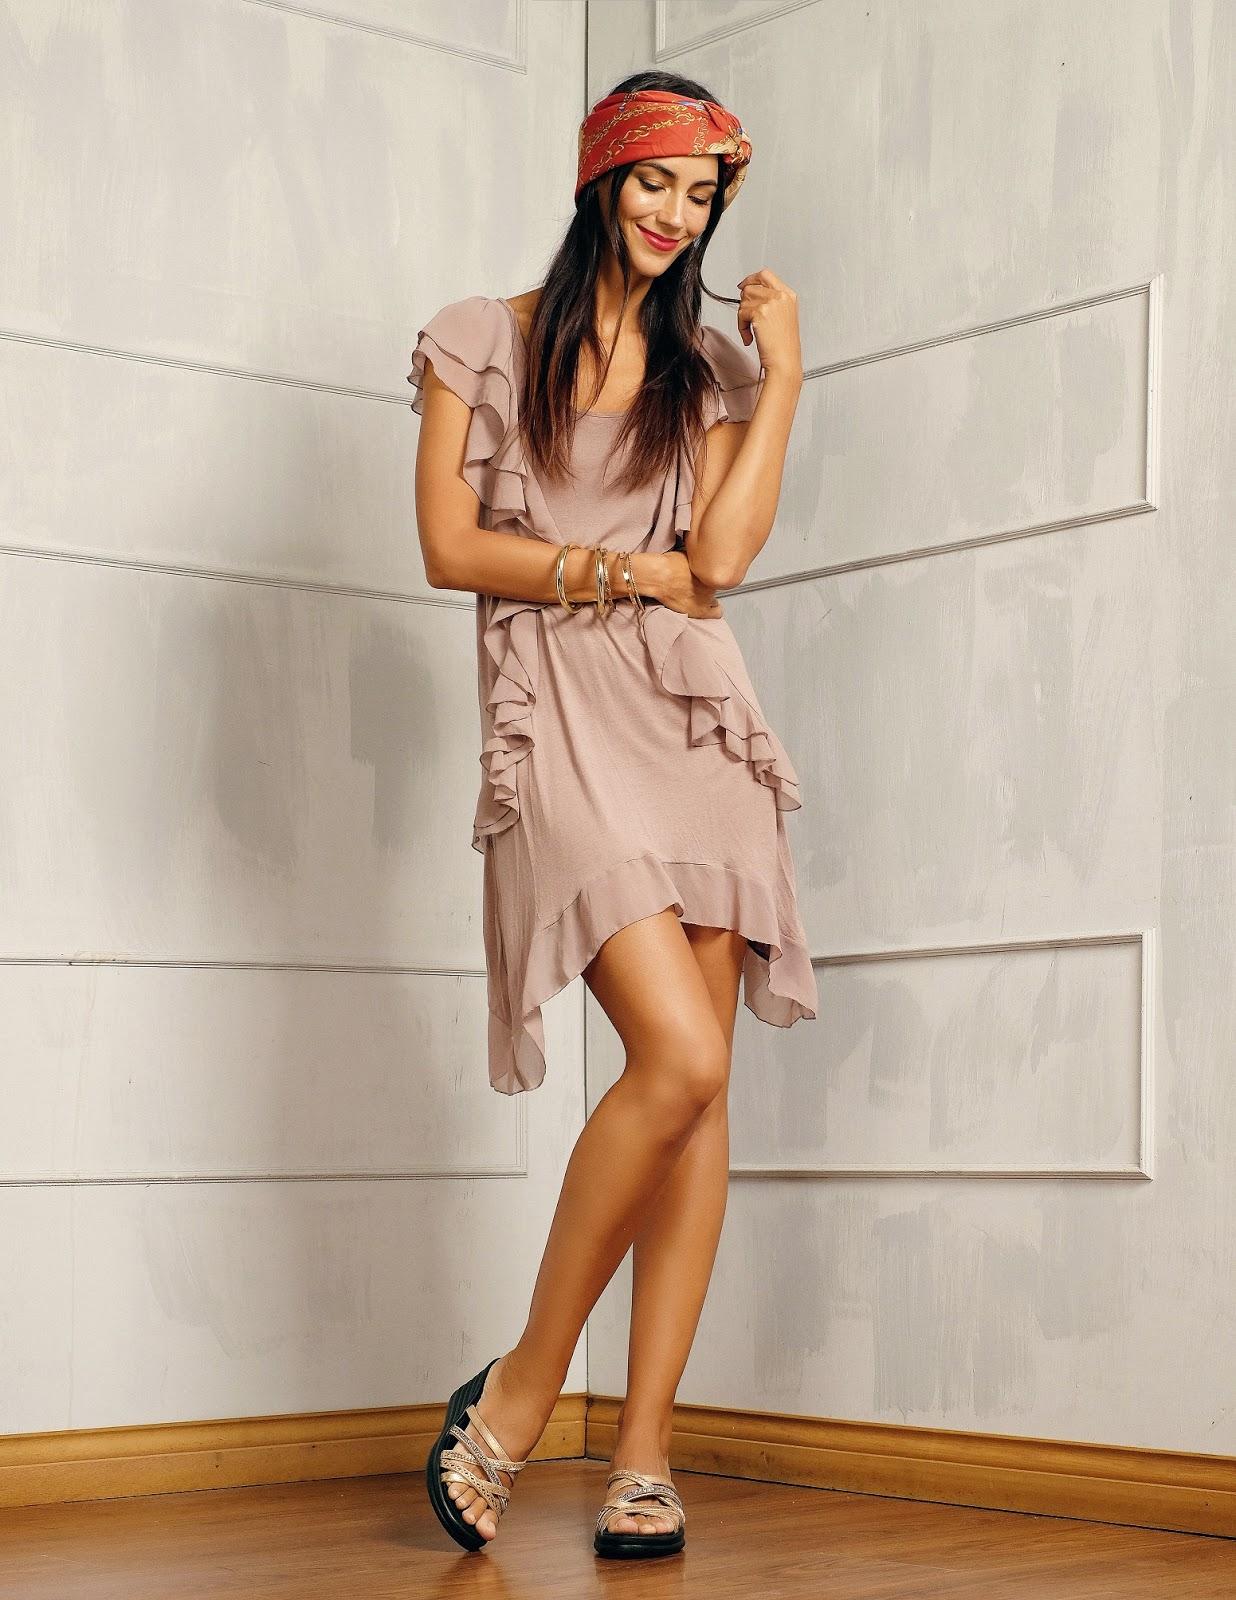 ca4e0a423e63 Maria Victoria Lifestyle Secrets  Skechers Sandals this Summer